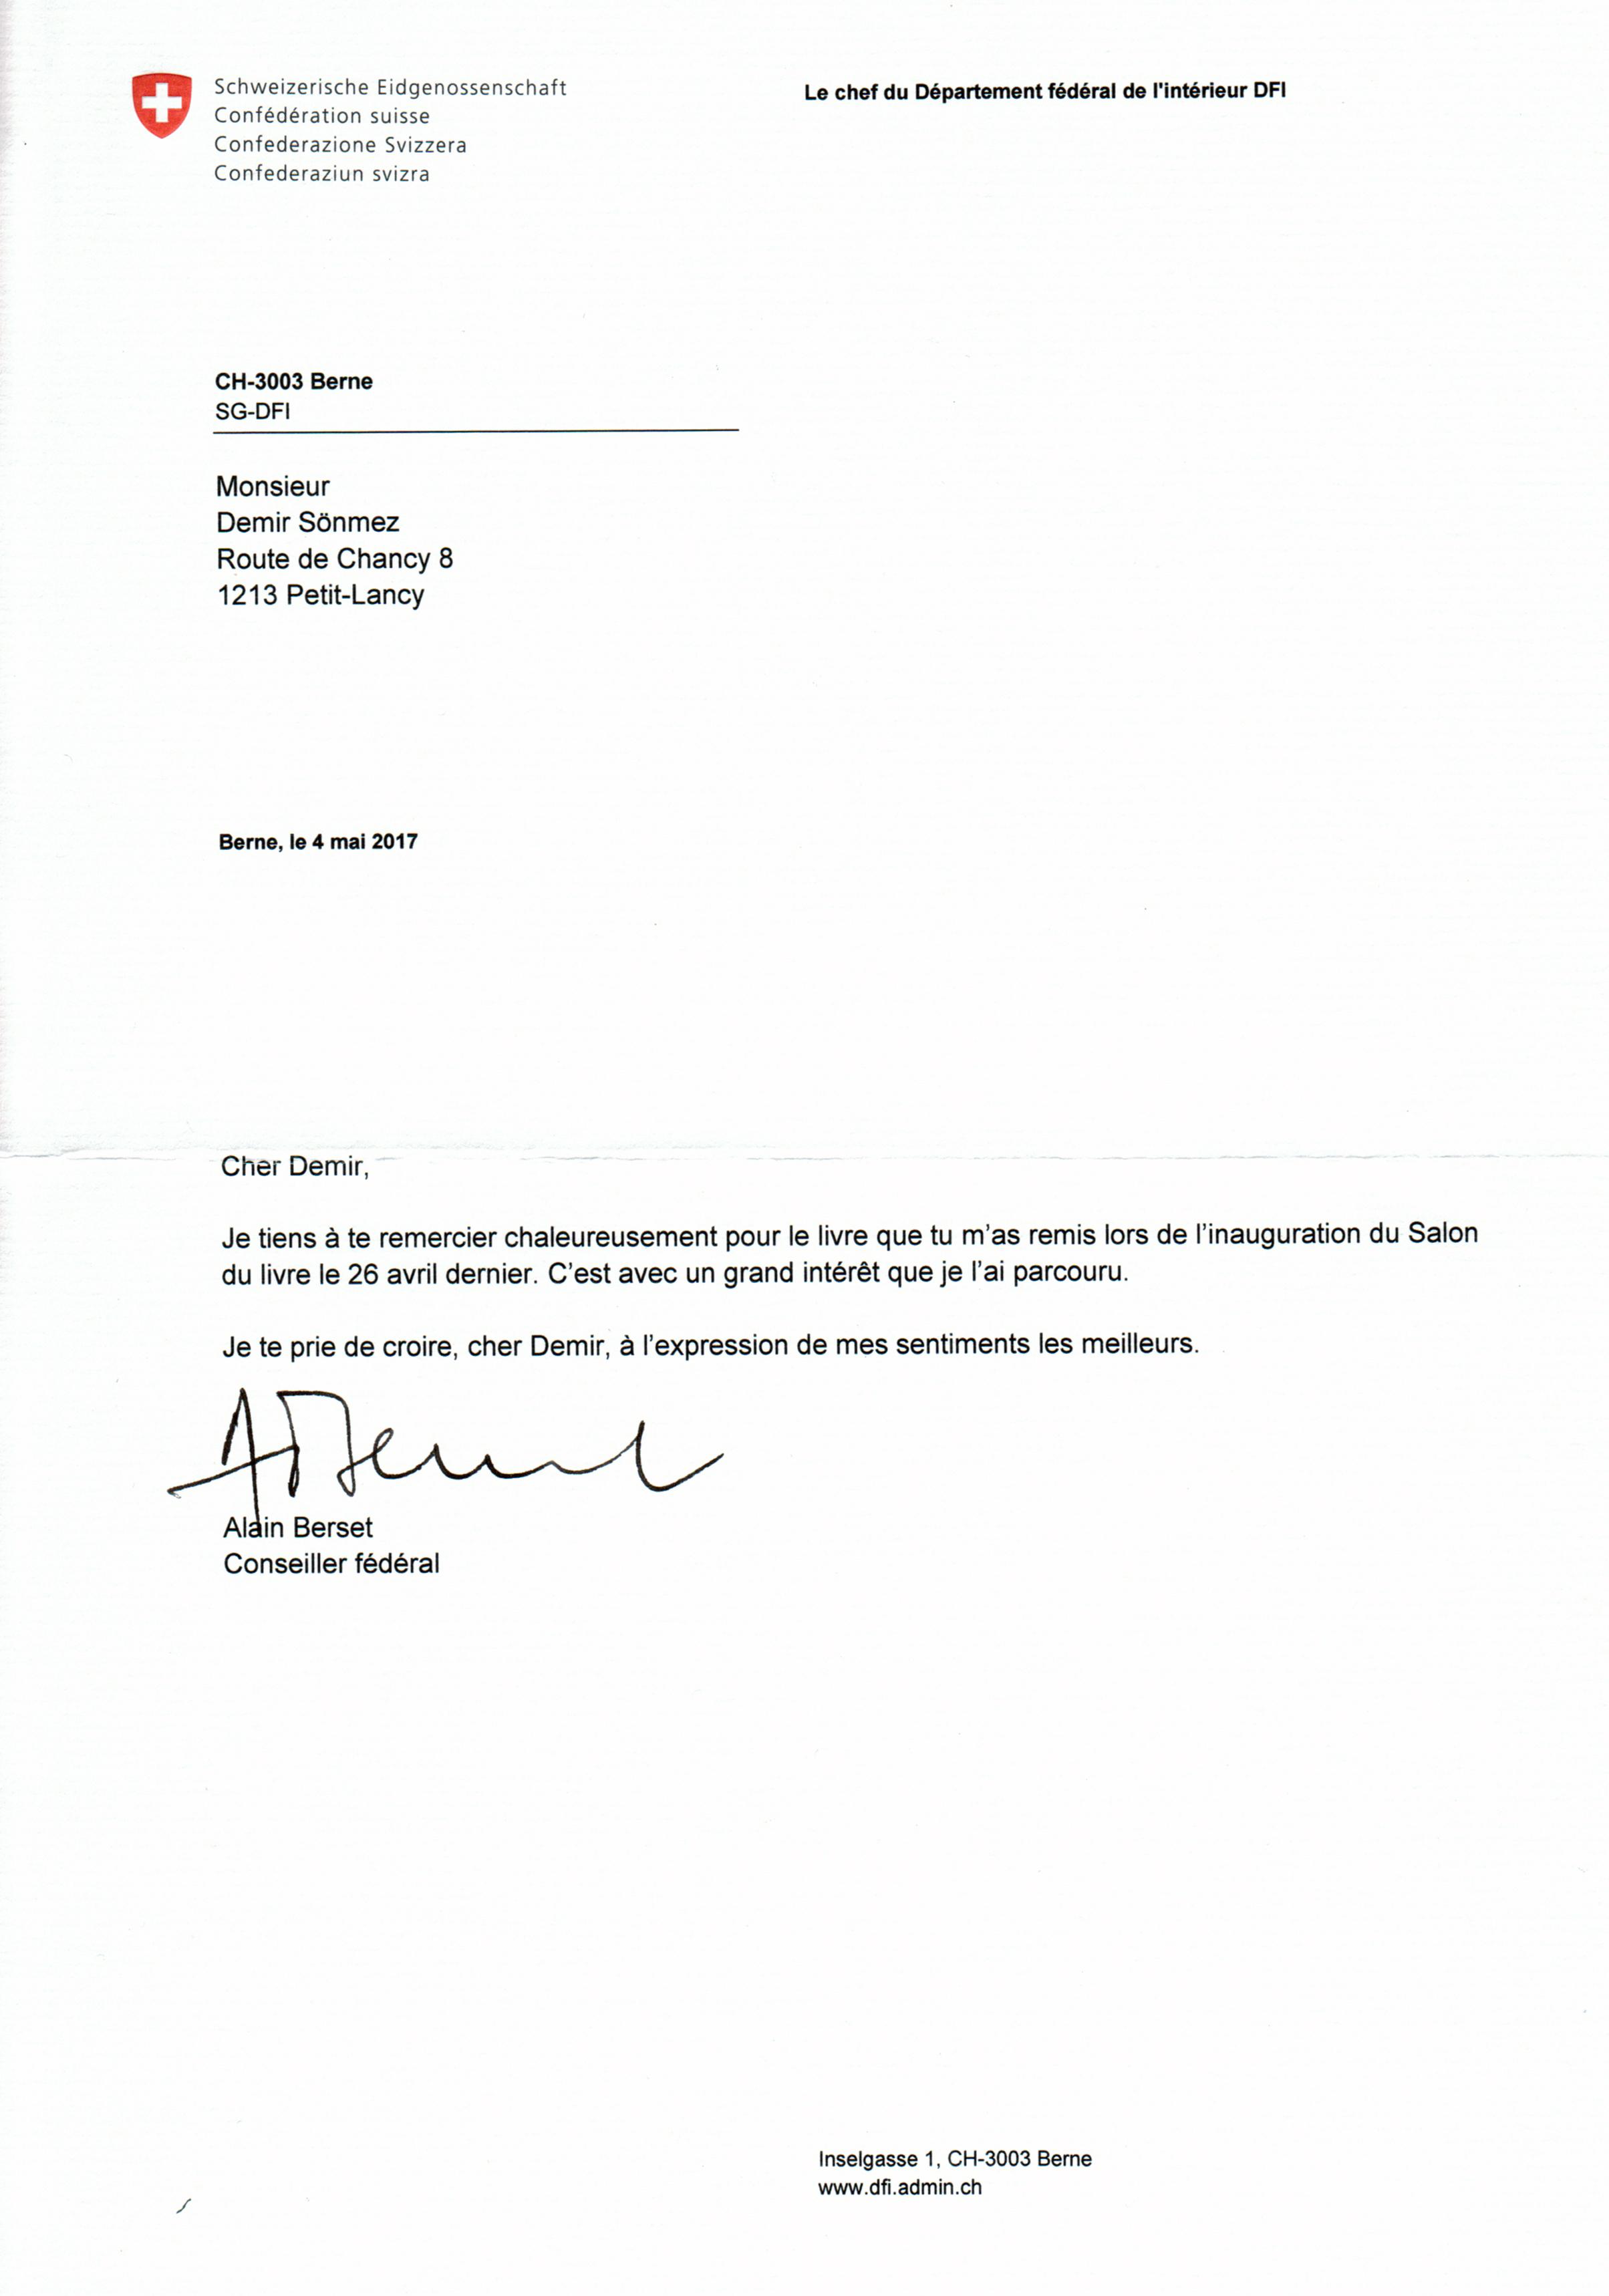 2017-04-05_La lettre  Conseiller Fédéral Alain Berset